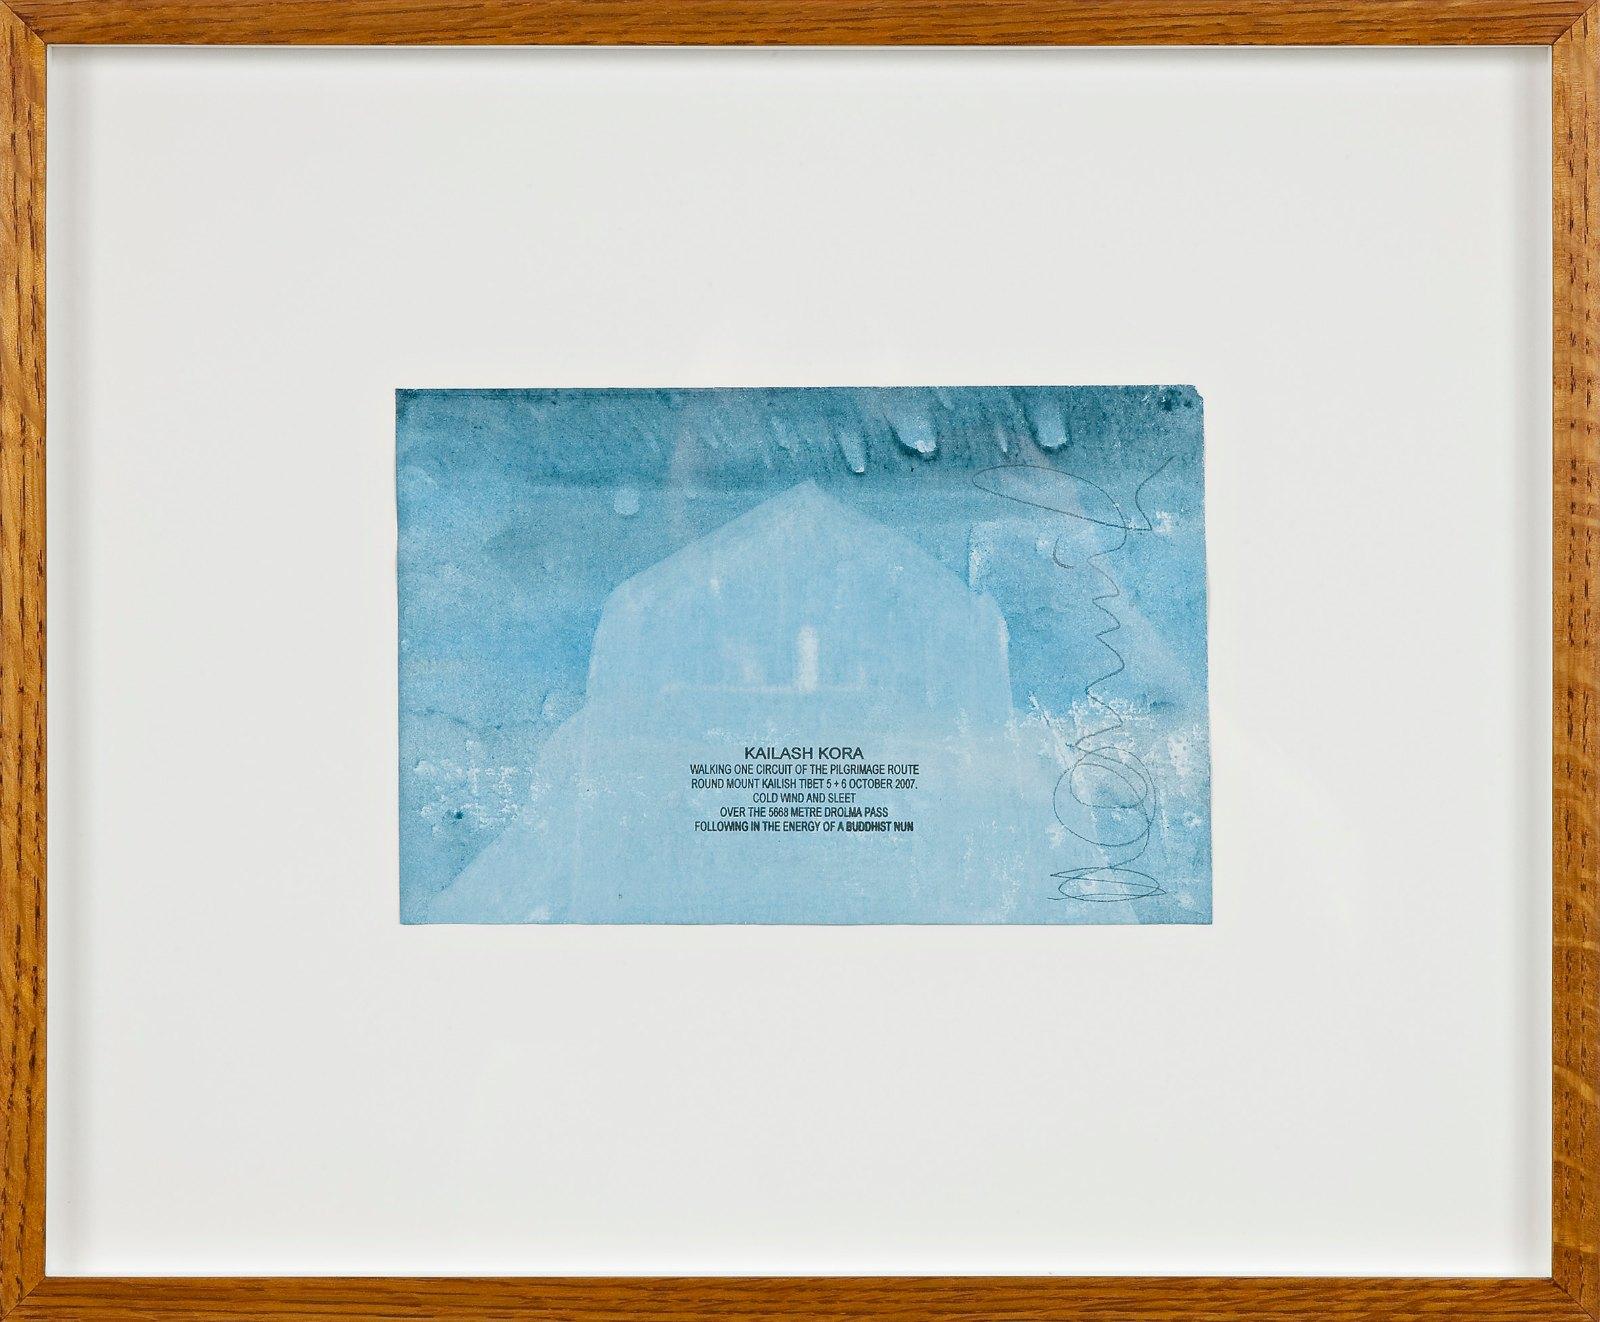 Kailash Kora, 2007, ink walk text on acrylic in artist frame, 15 x 22.5 cm